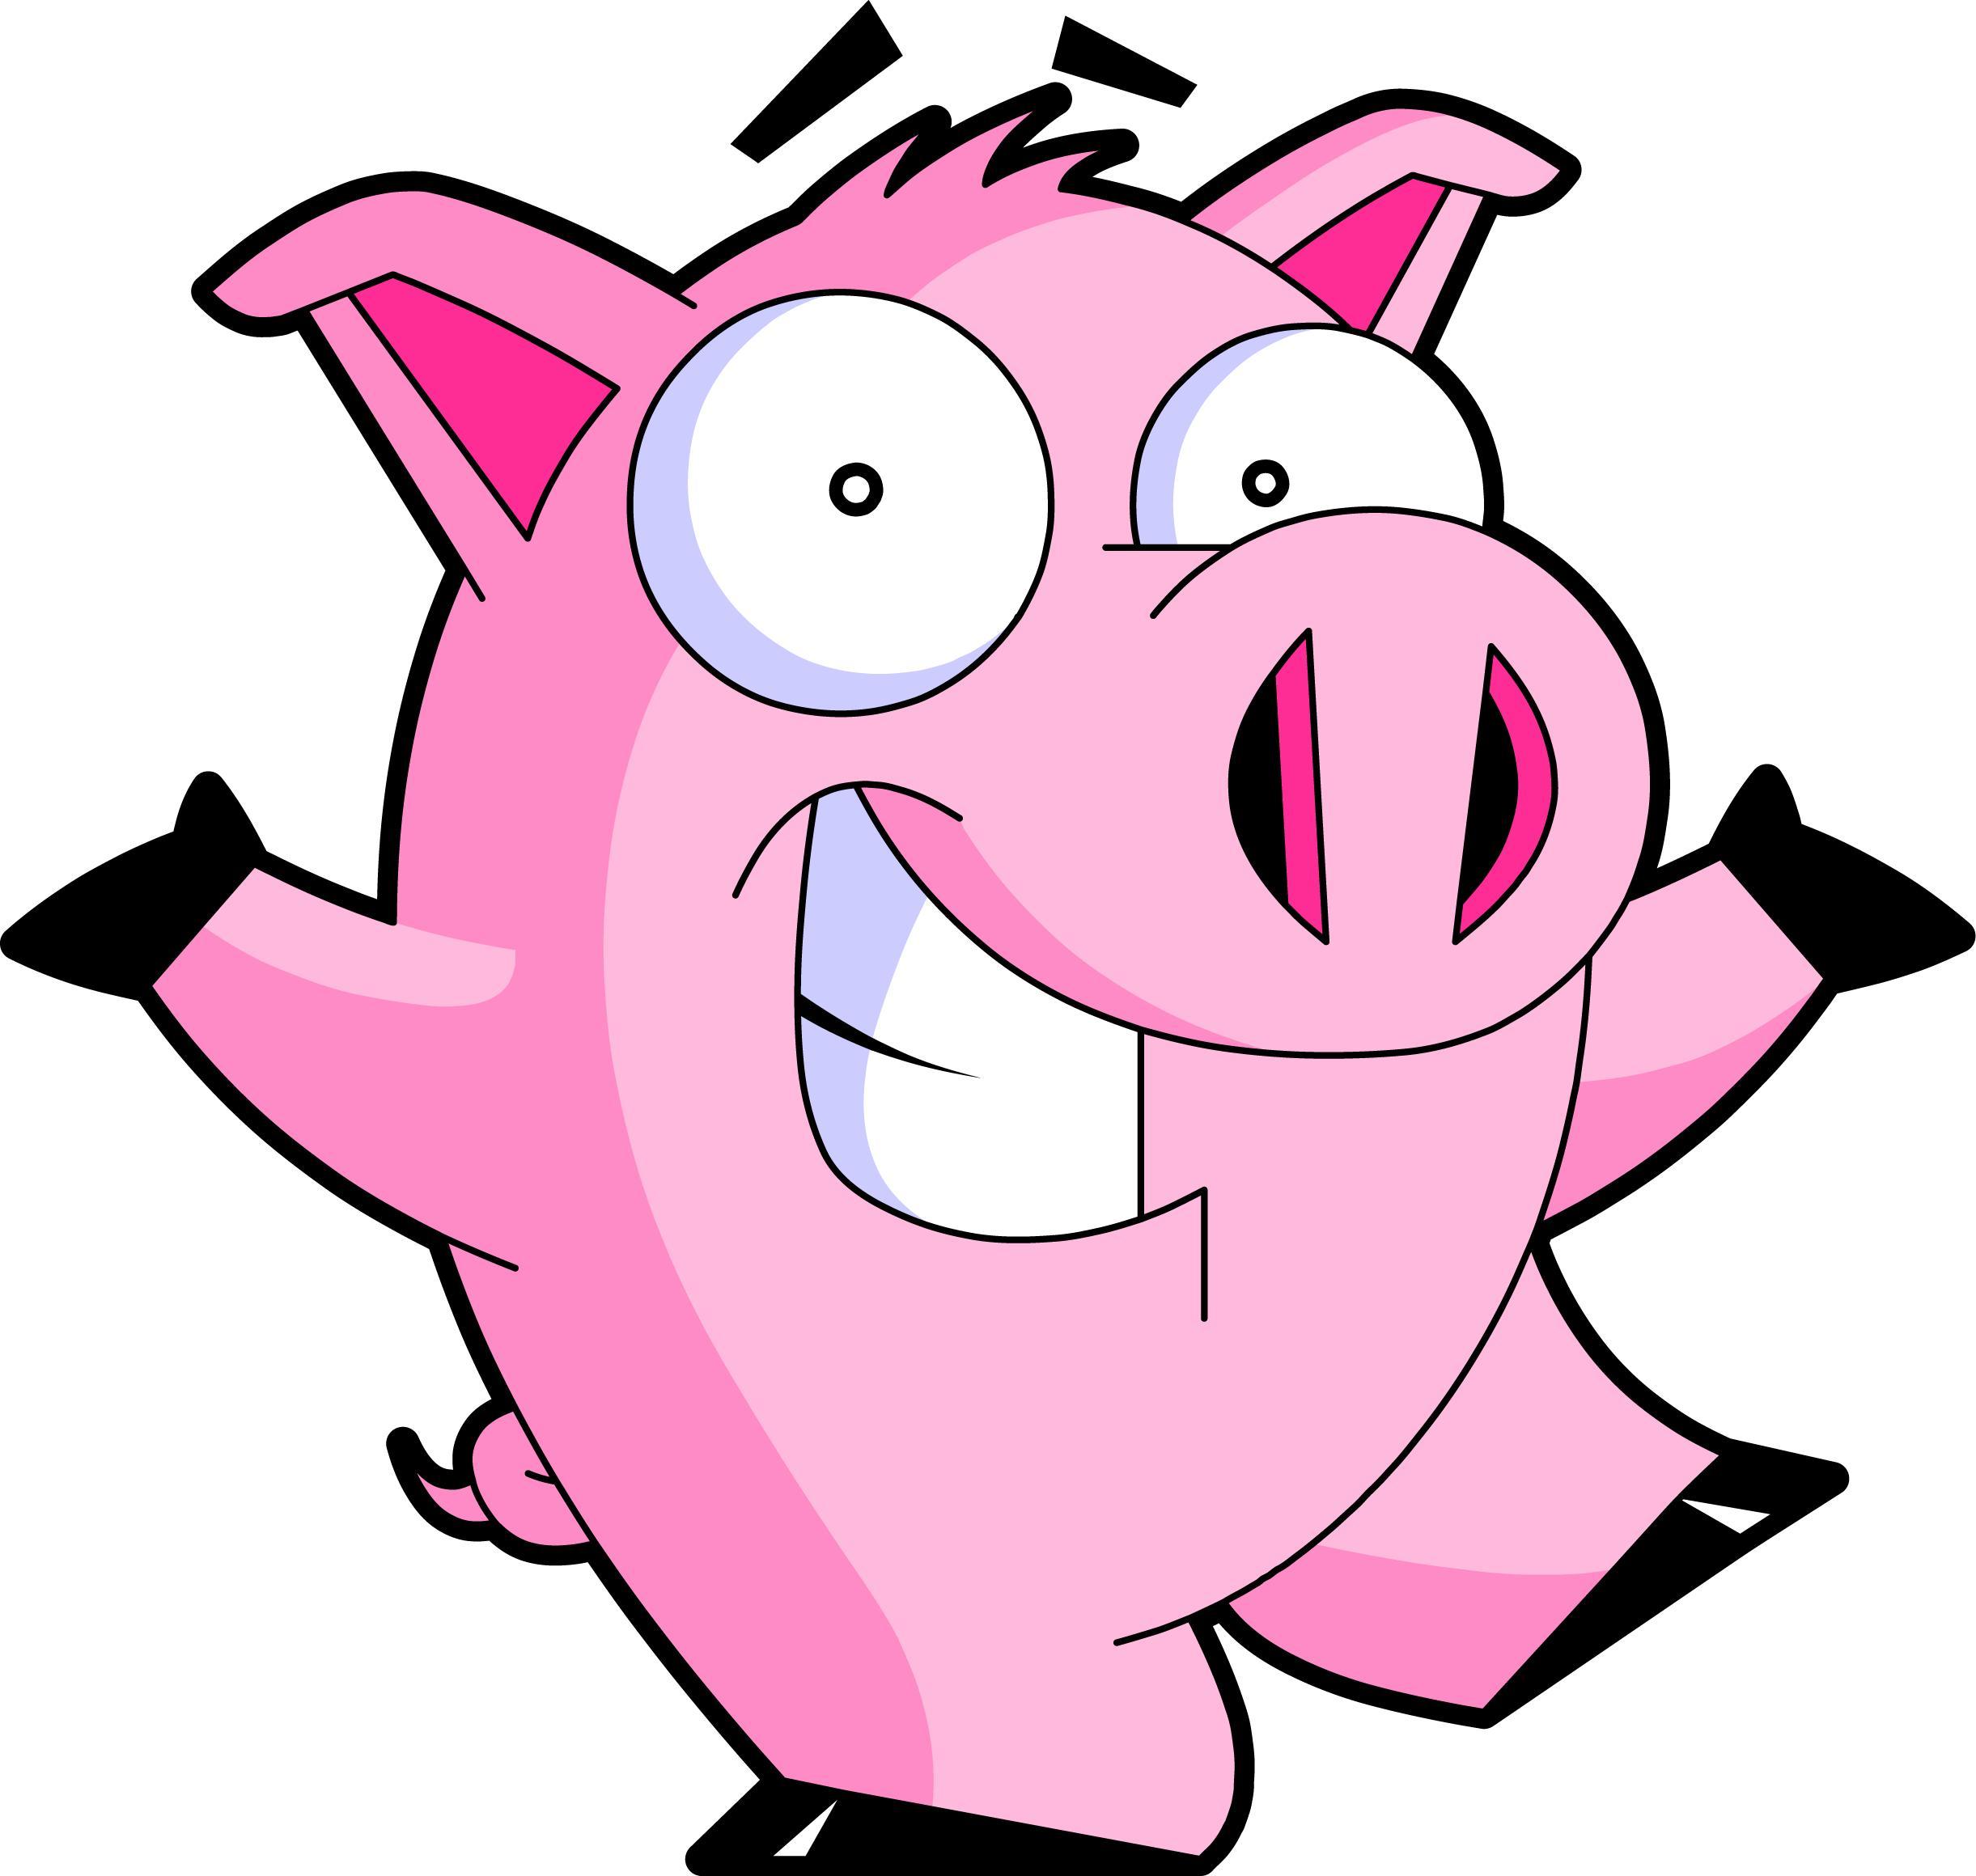 2442x2319 Pig Clip Art 3 Image 0 3